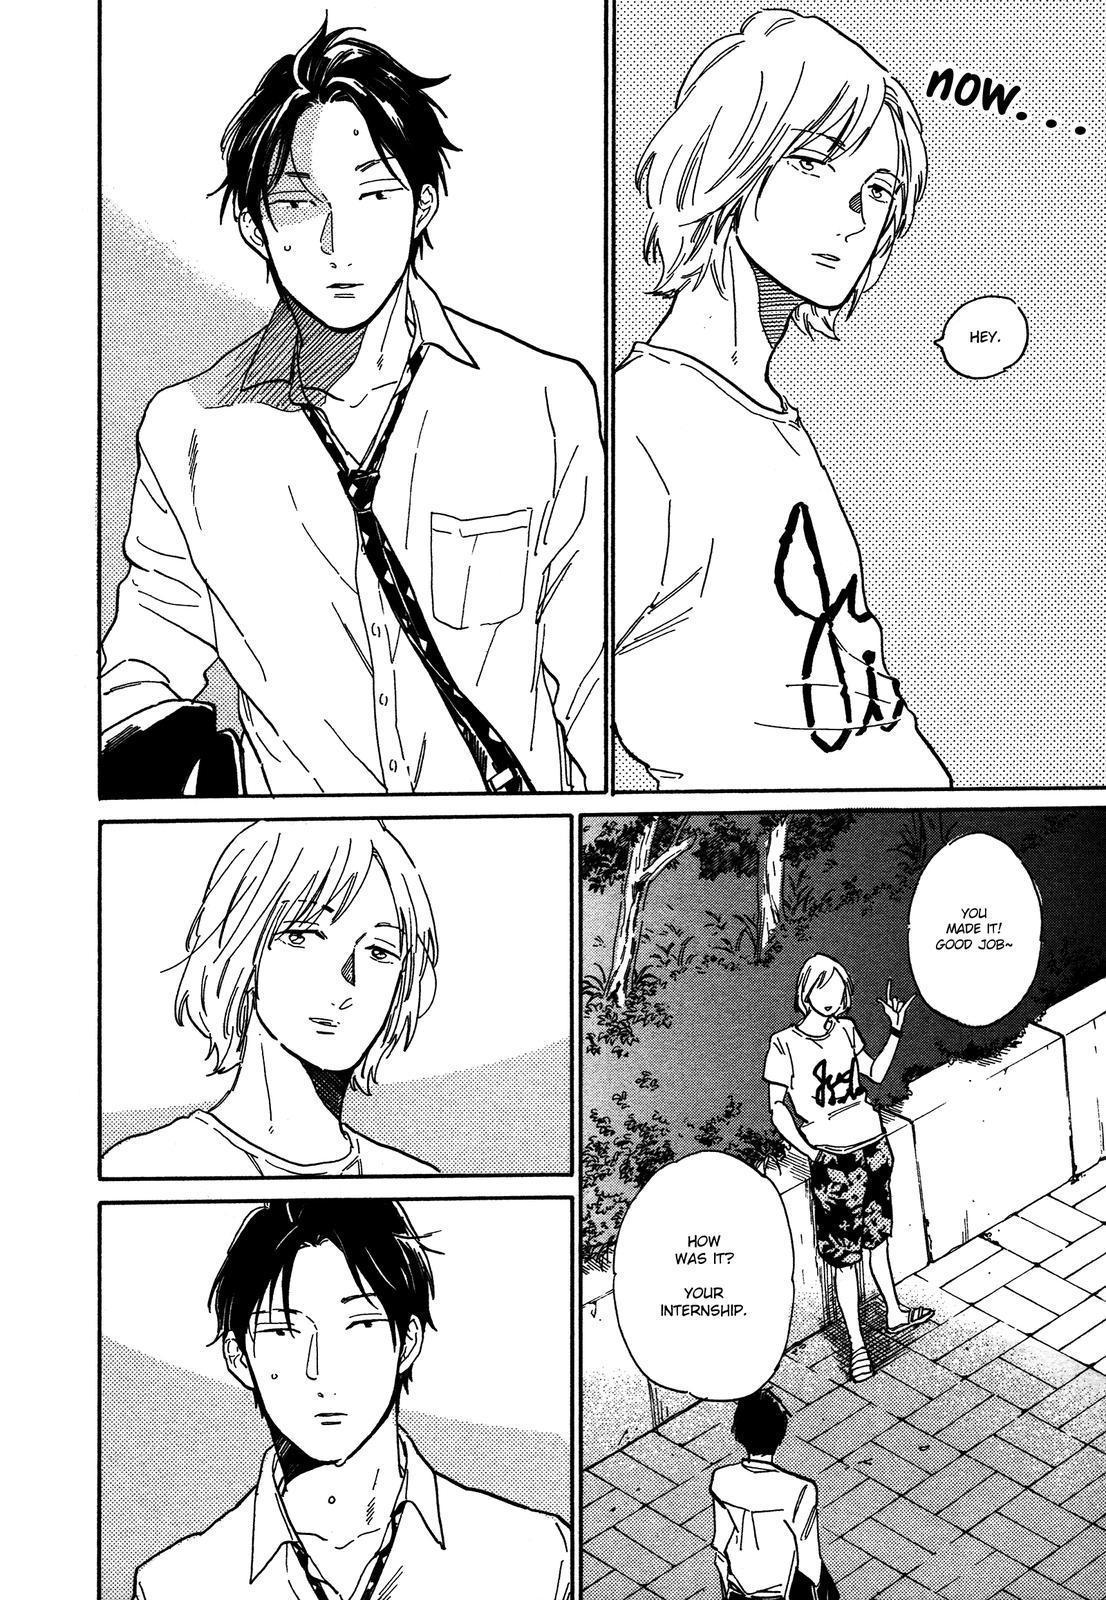 Stay Gold (Hideyoshico) Chapter 19 page 21 - Mangakakalots.com